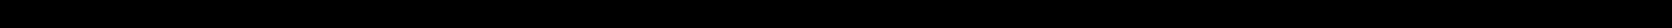 POWER BLACK LISTA